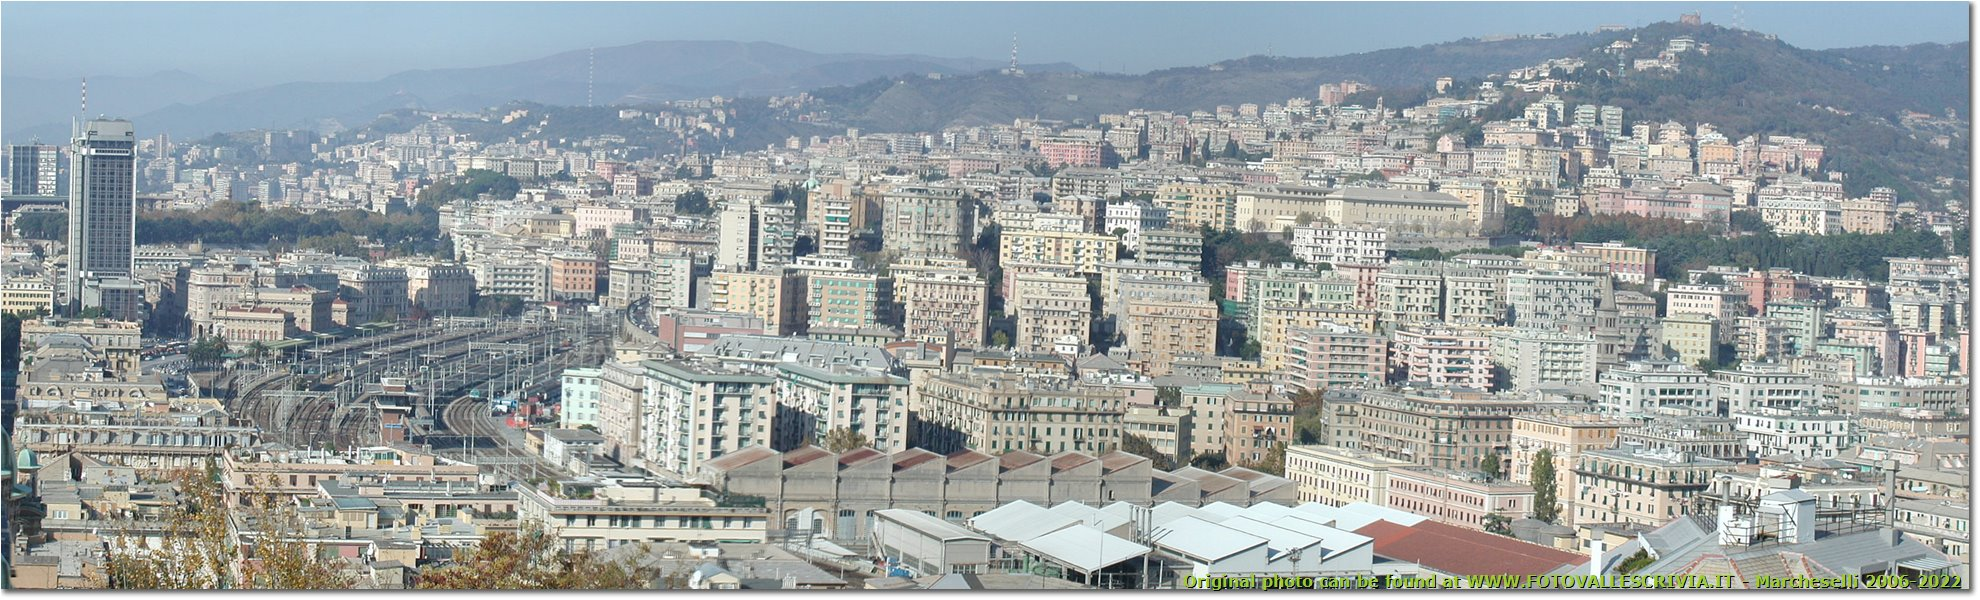 Fotografie Genova - Paesi - Panorama from Engineering University